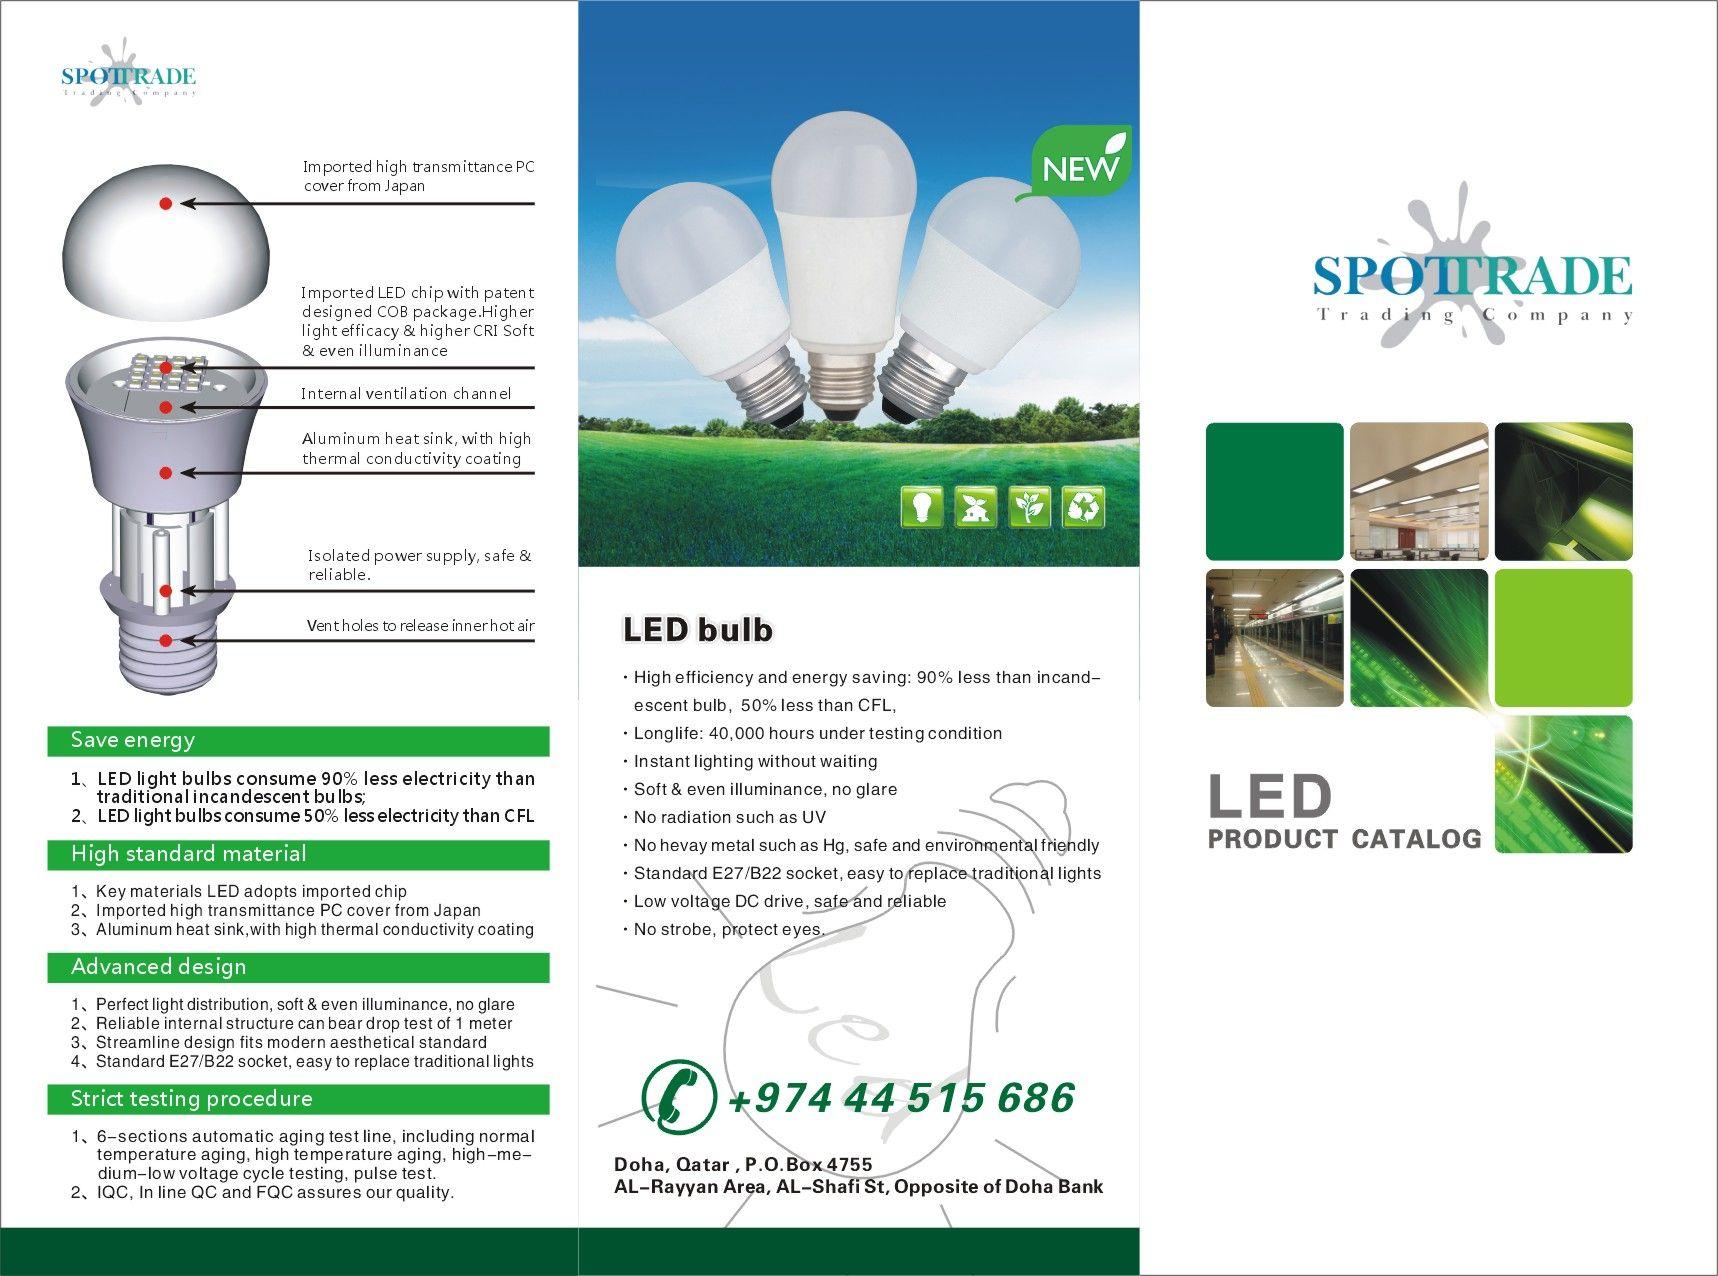 Save Up To 90 Of Power By Using Led Bulbs Led Bulb Led Light Bulbs Bulb